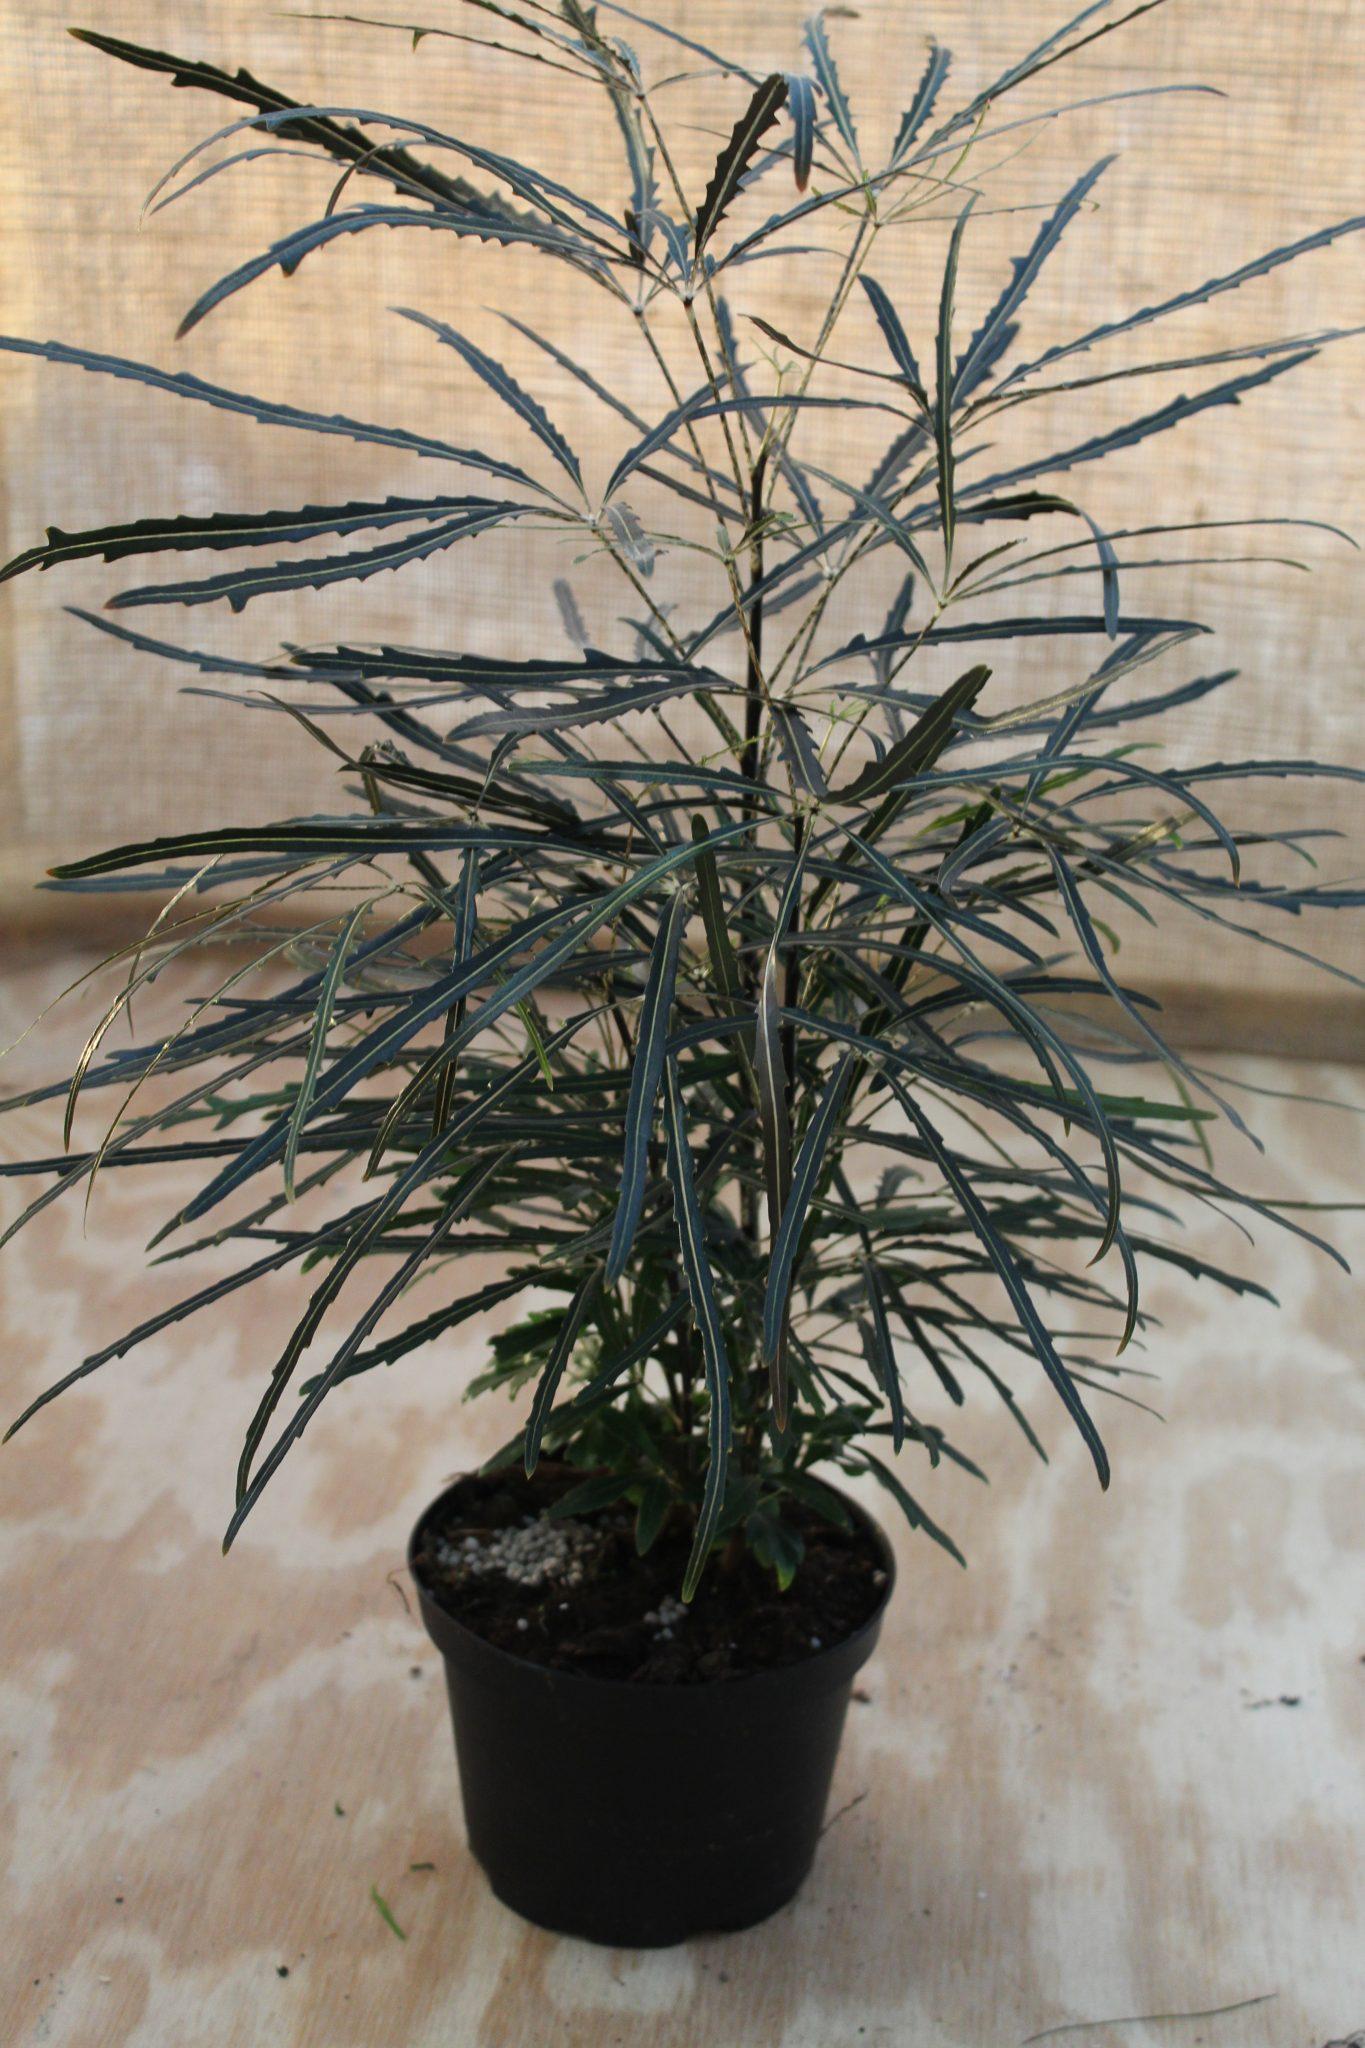 False Aralia 'Elegantissima' - 6 Inch Pot